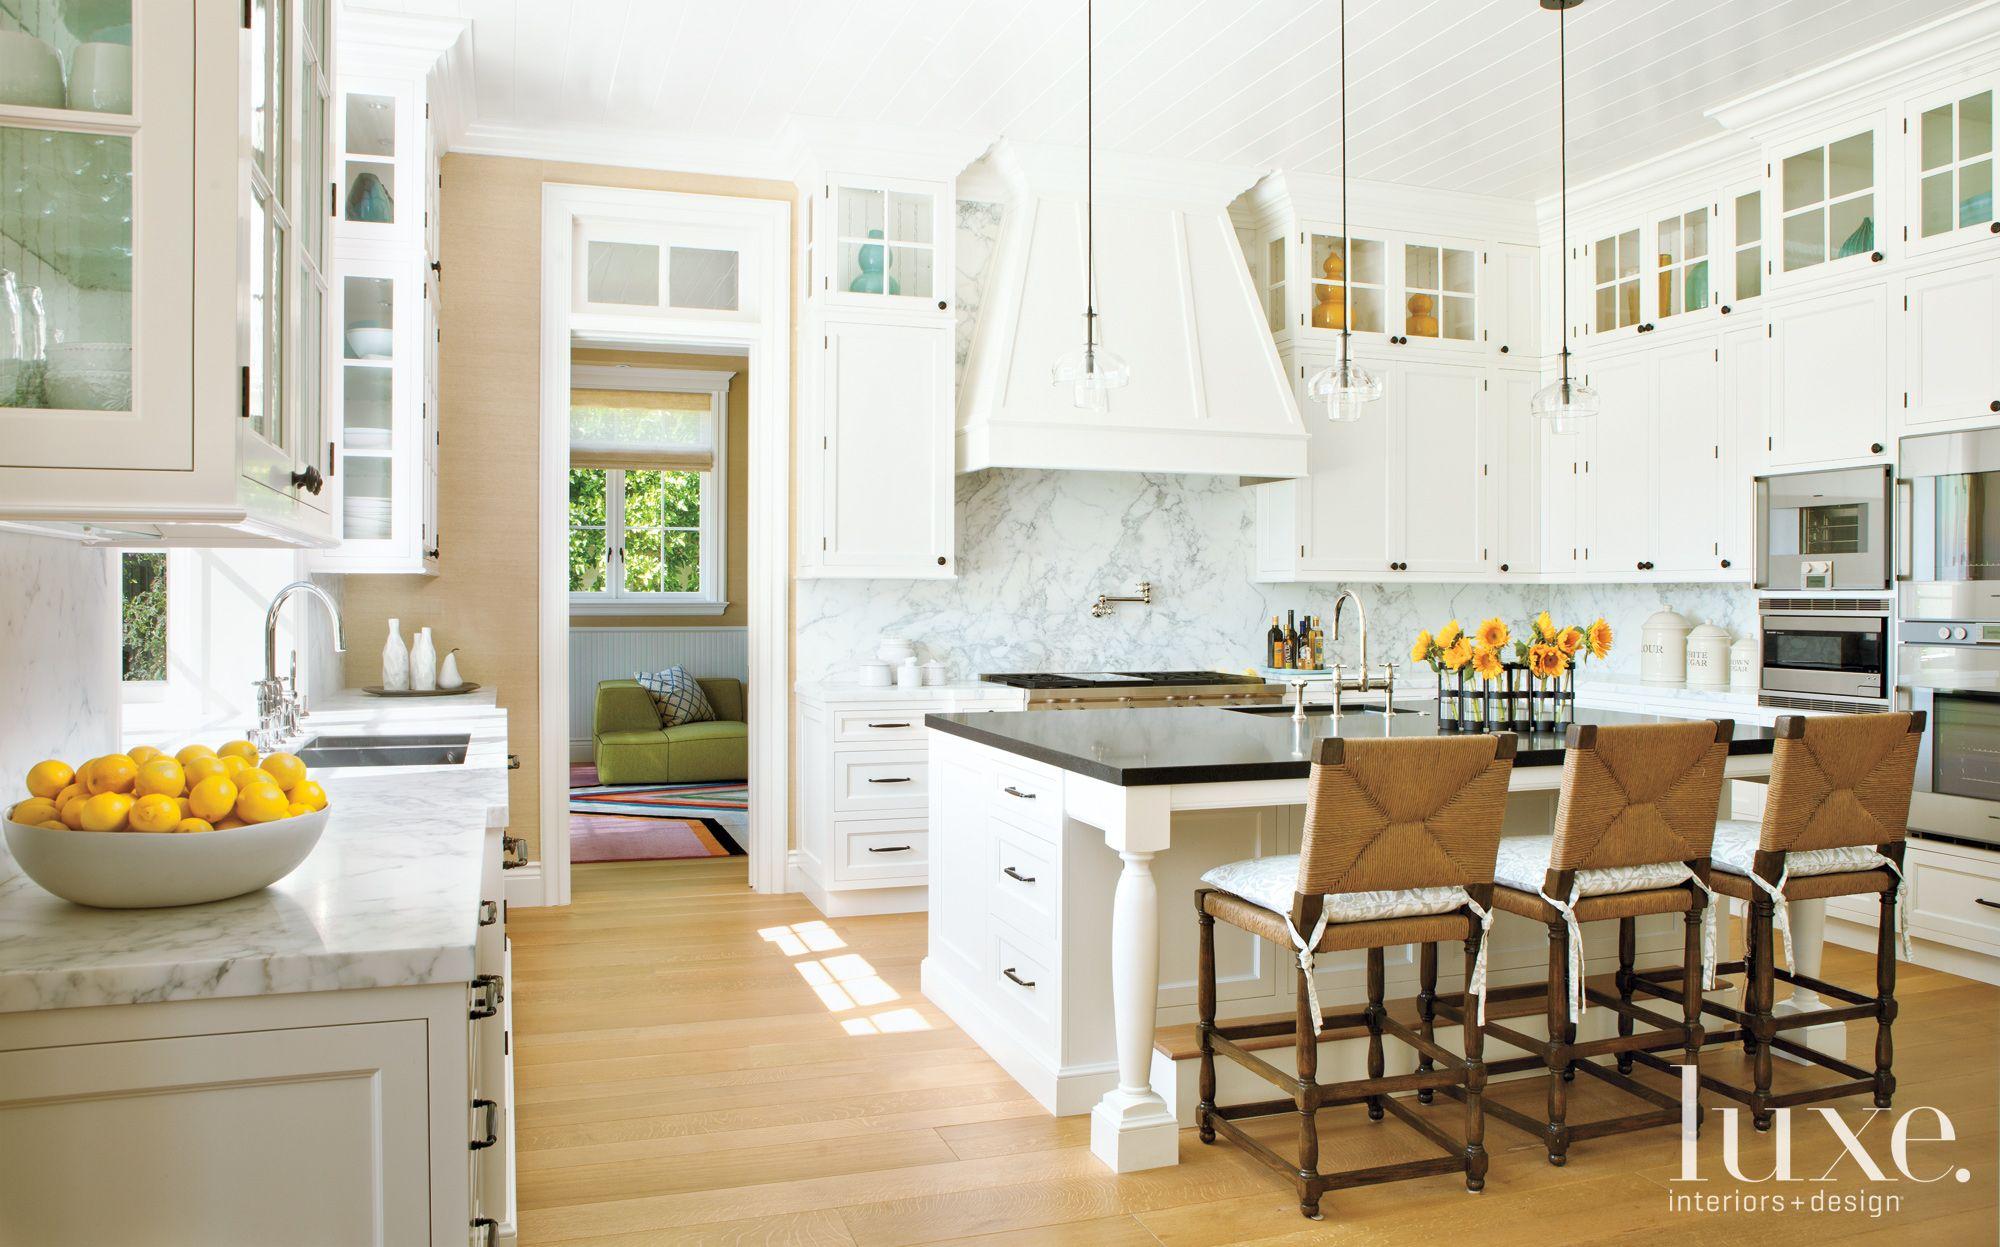 Transitional White Kitchen with Marble Backsplash